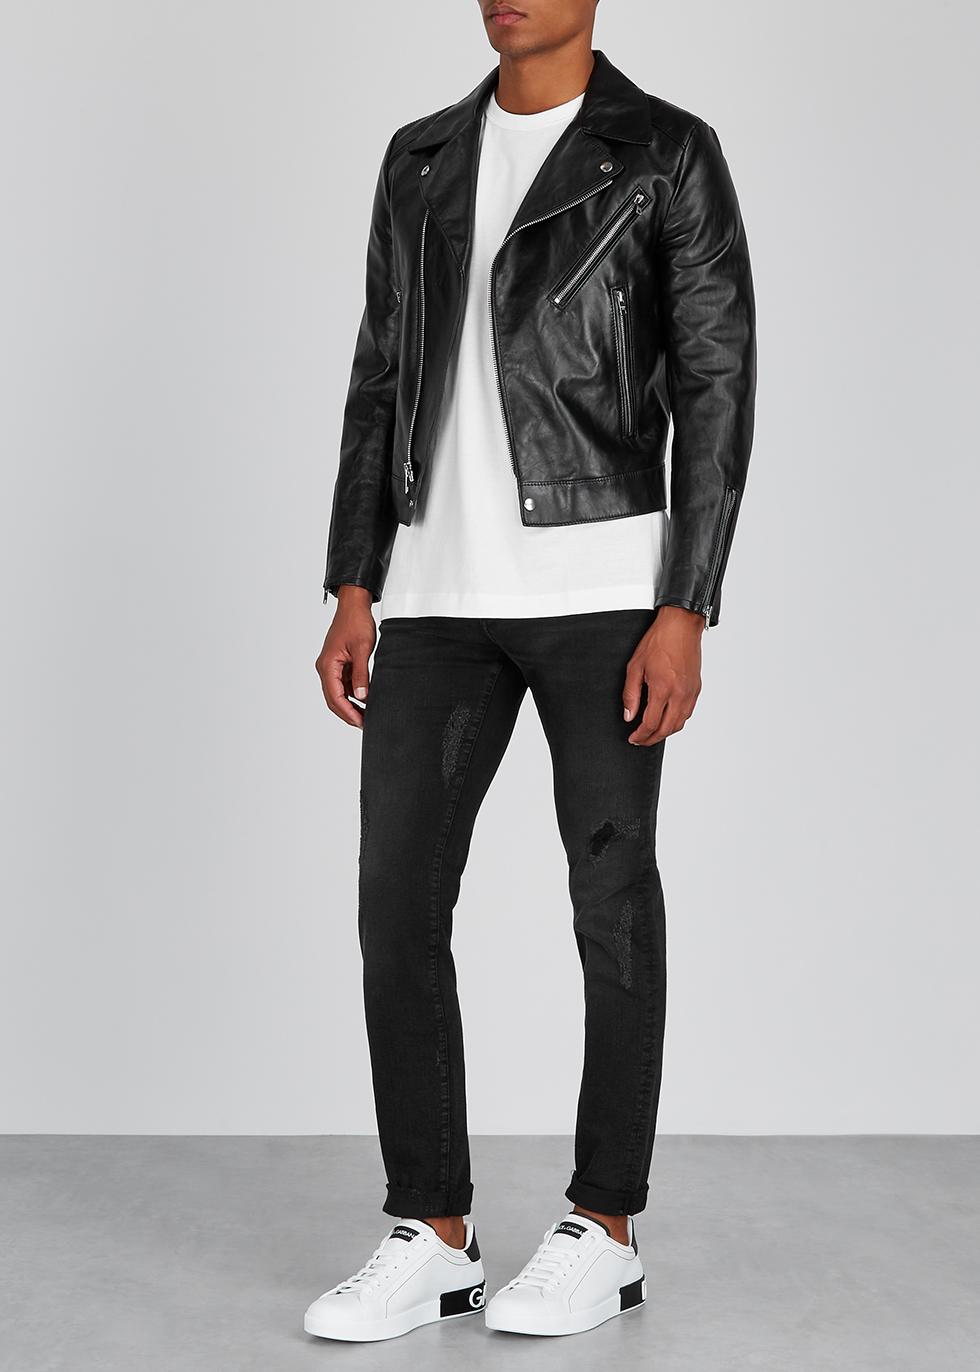 9591731de Men s Designer Jeans and Luxury Denim - Harvey Nichols